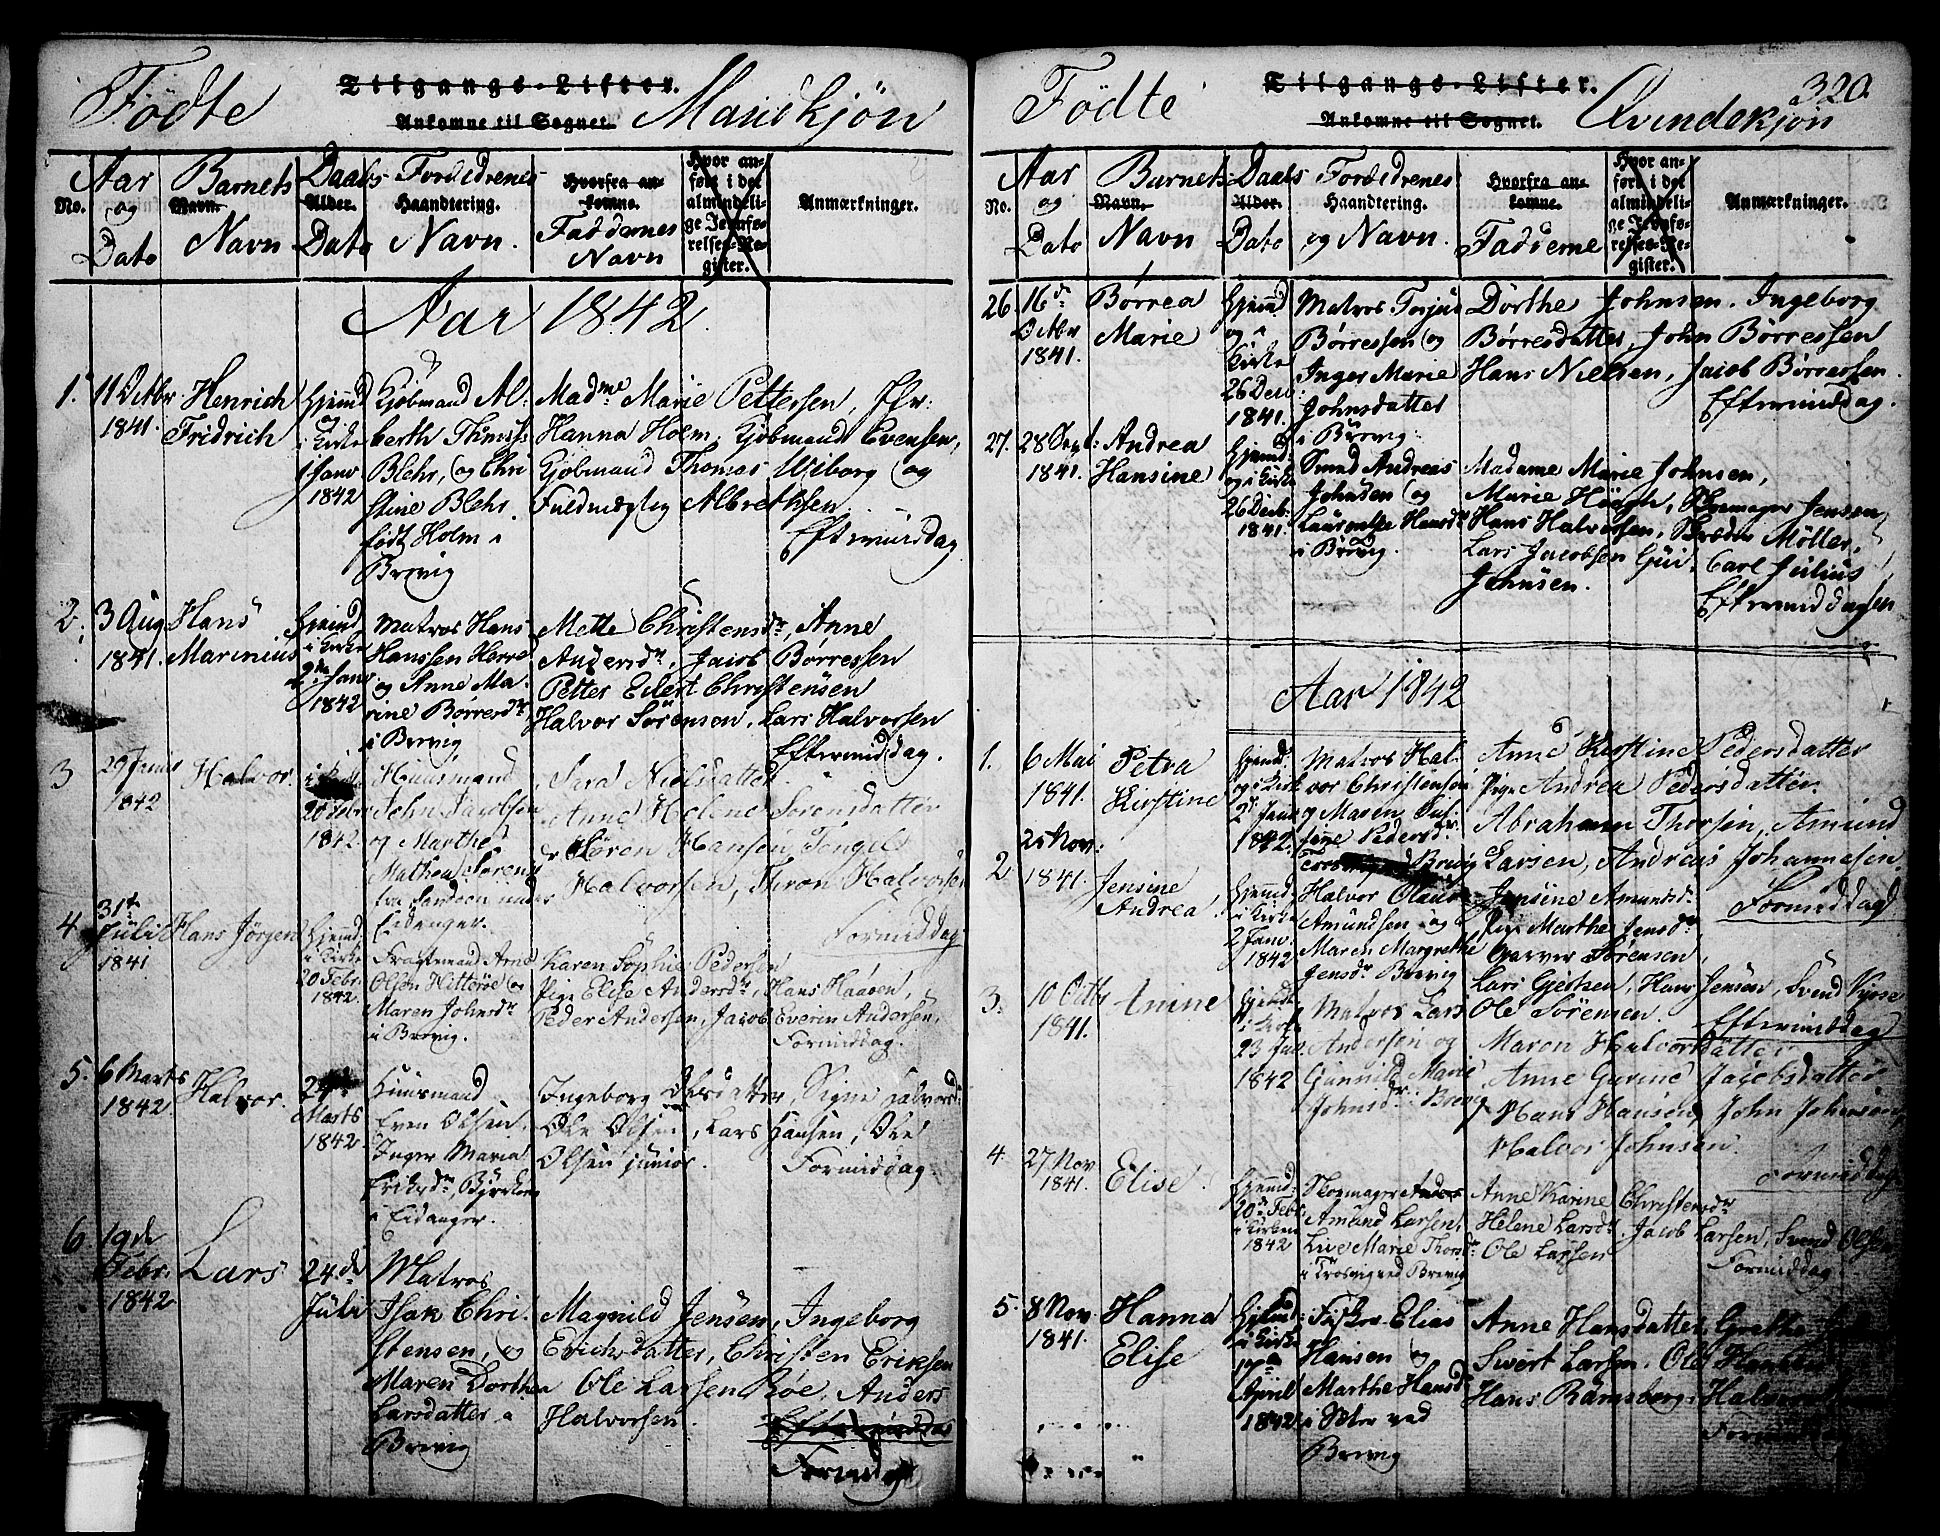 SAKO, Brevik kirkebøker, G/Ga/L0001: Klokkerbok nr. 1, 1814-1845, s. 320